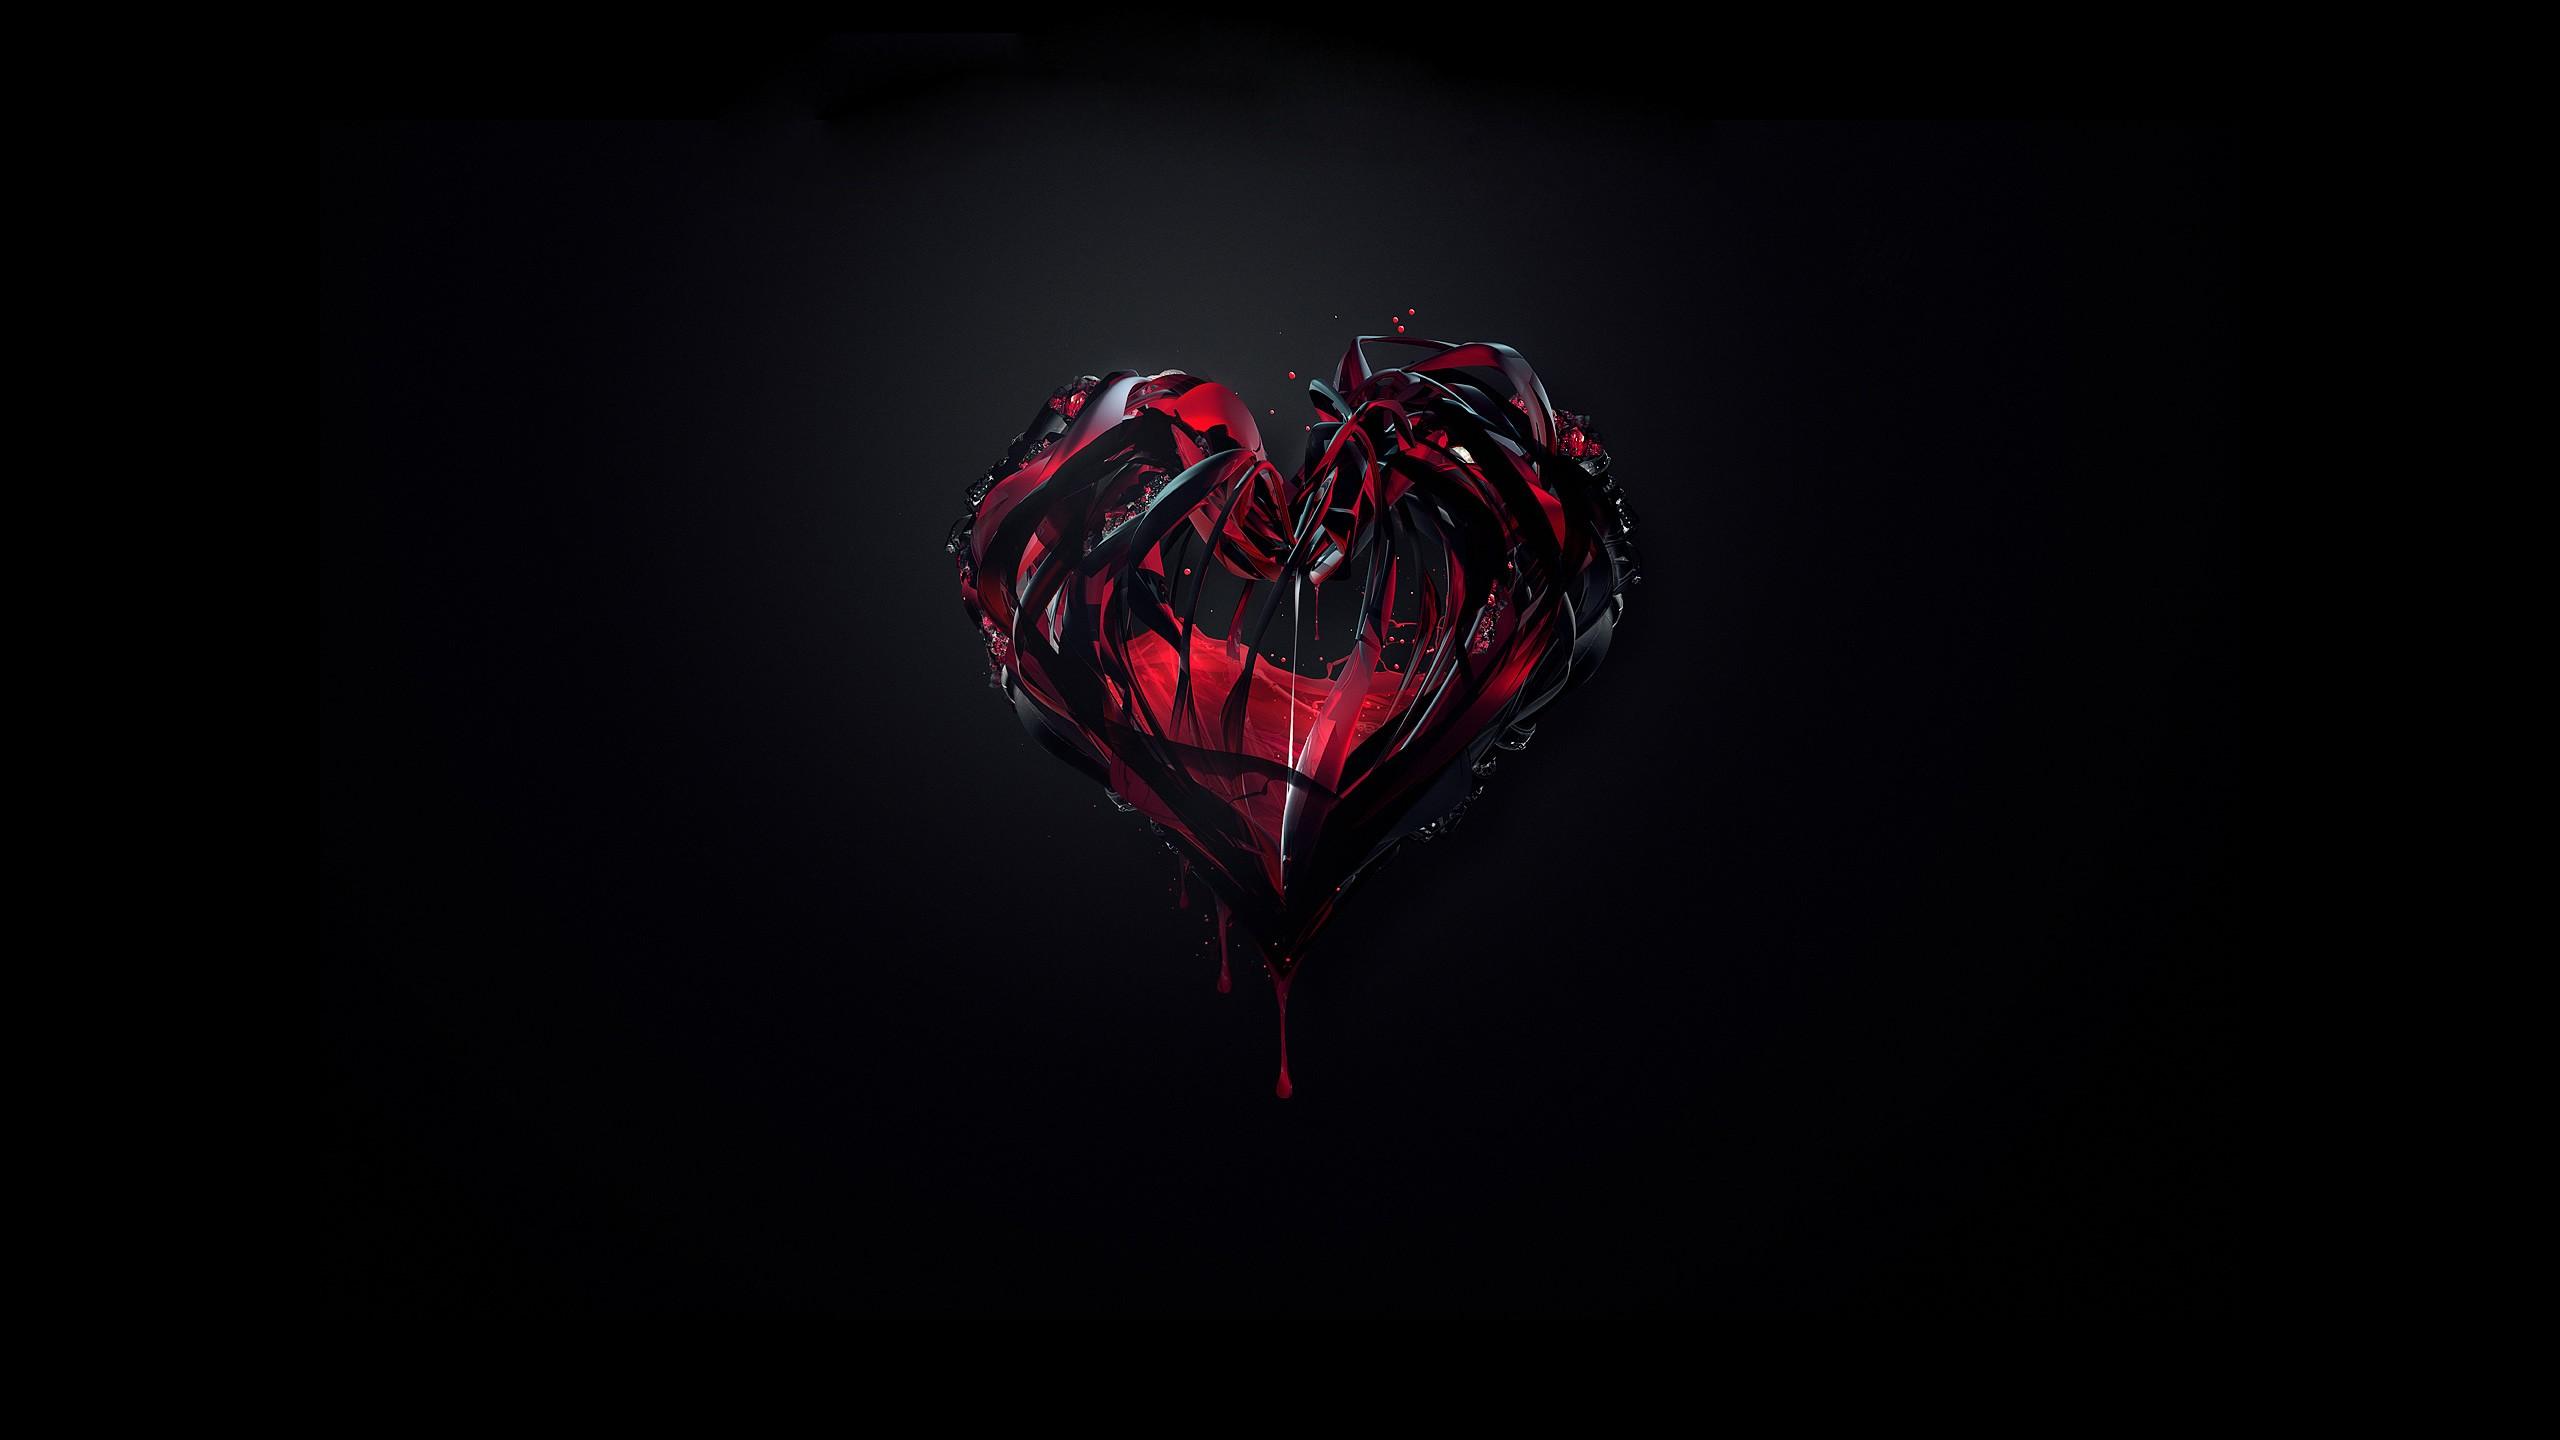 Download Love Black Wallpaper 2560x1440 Wallpoper 385348 2560x1440